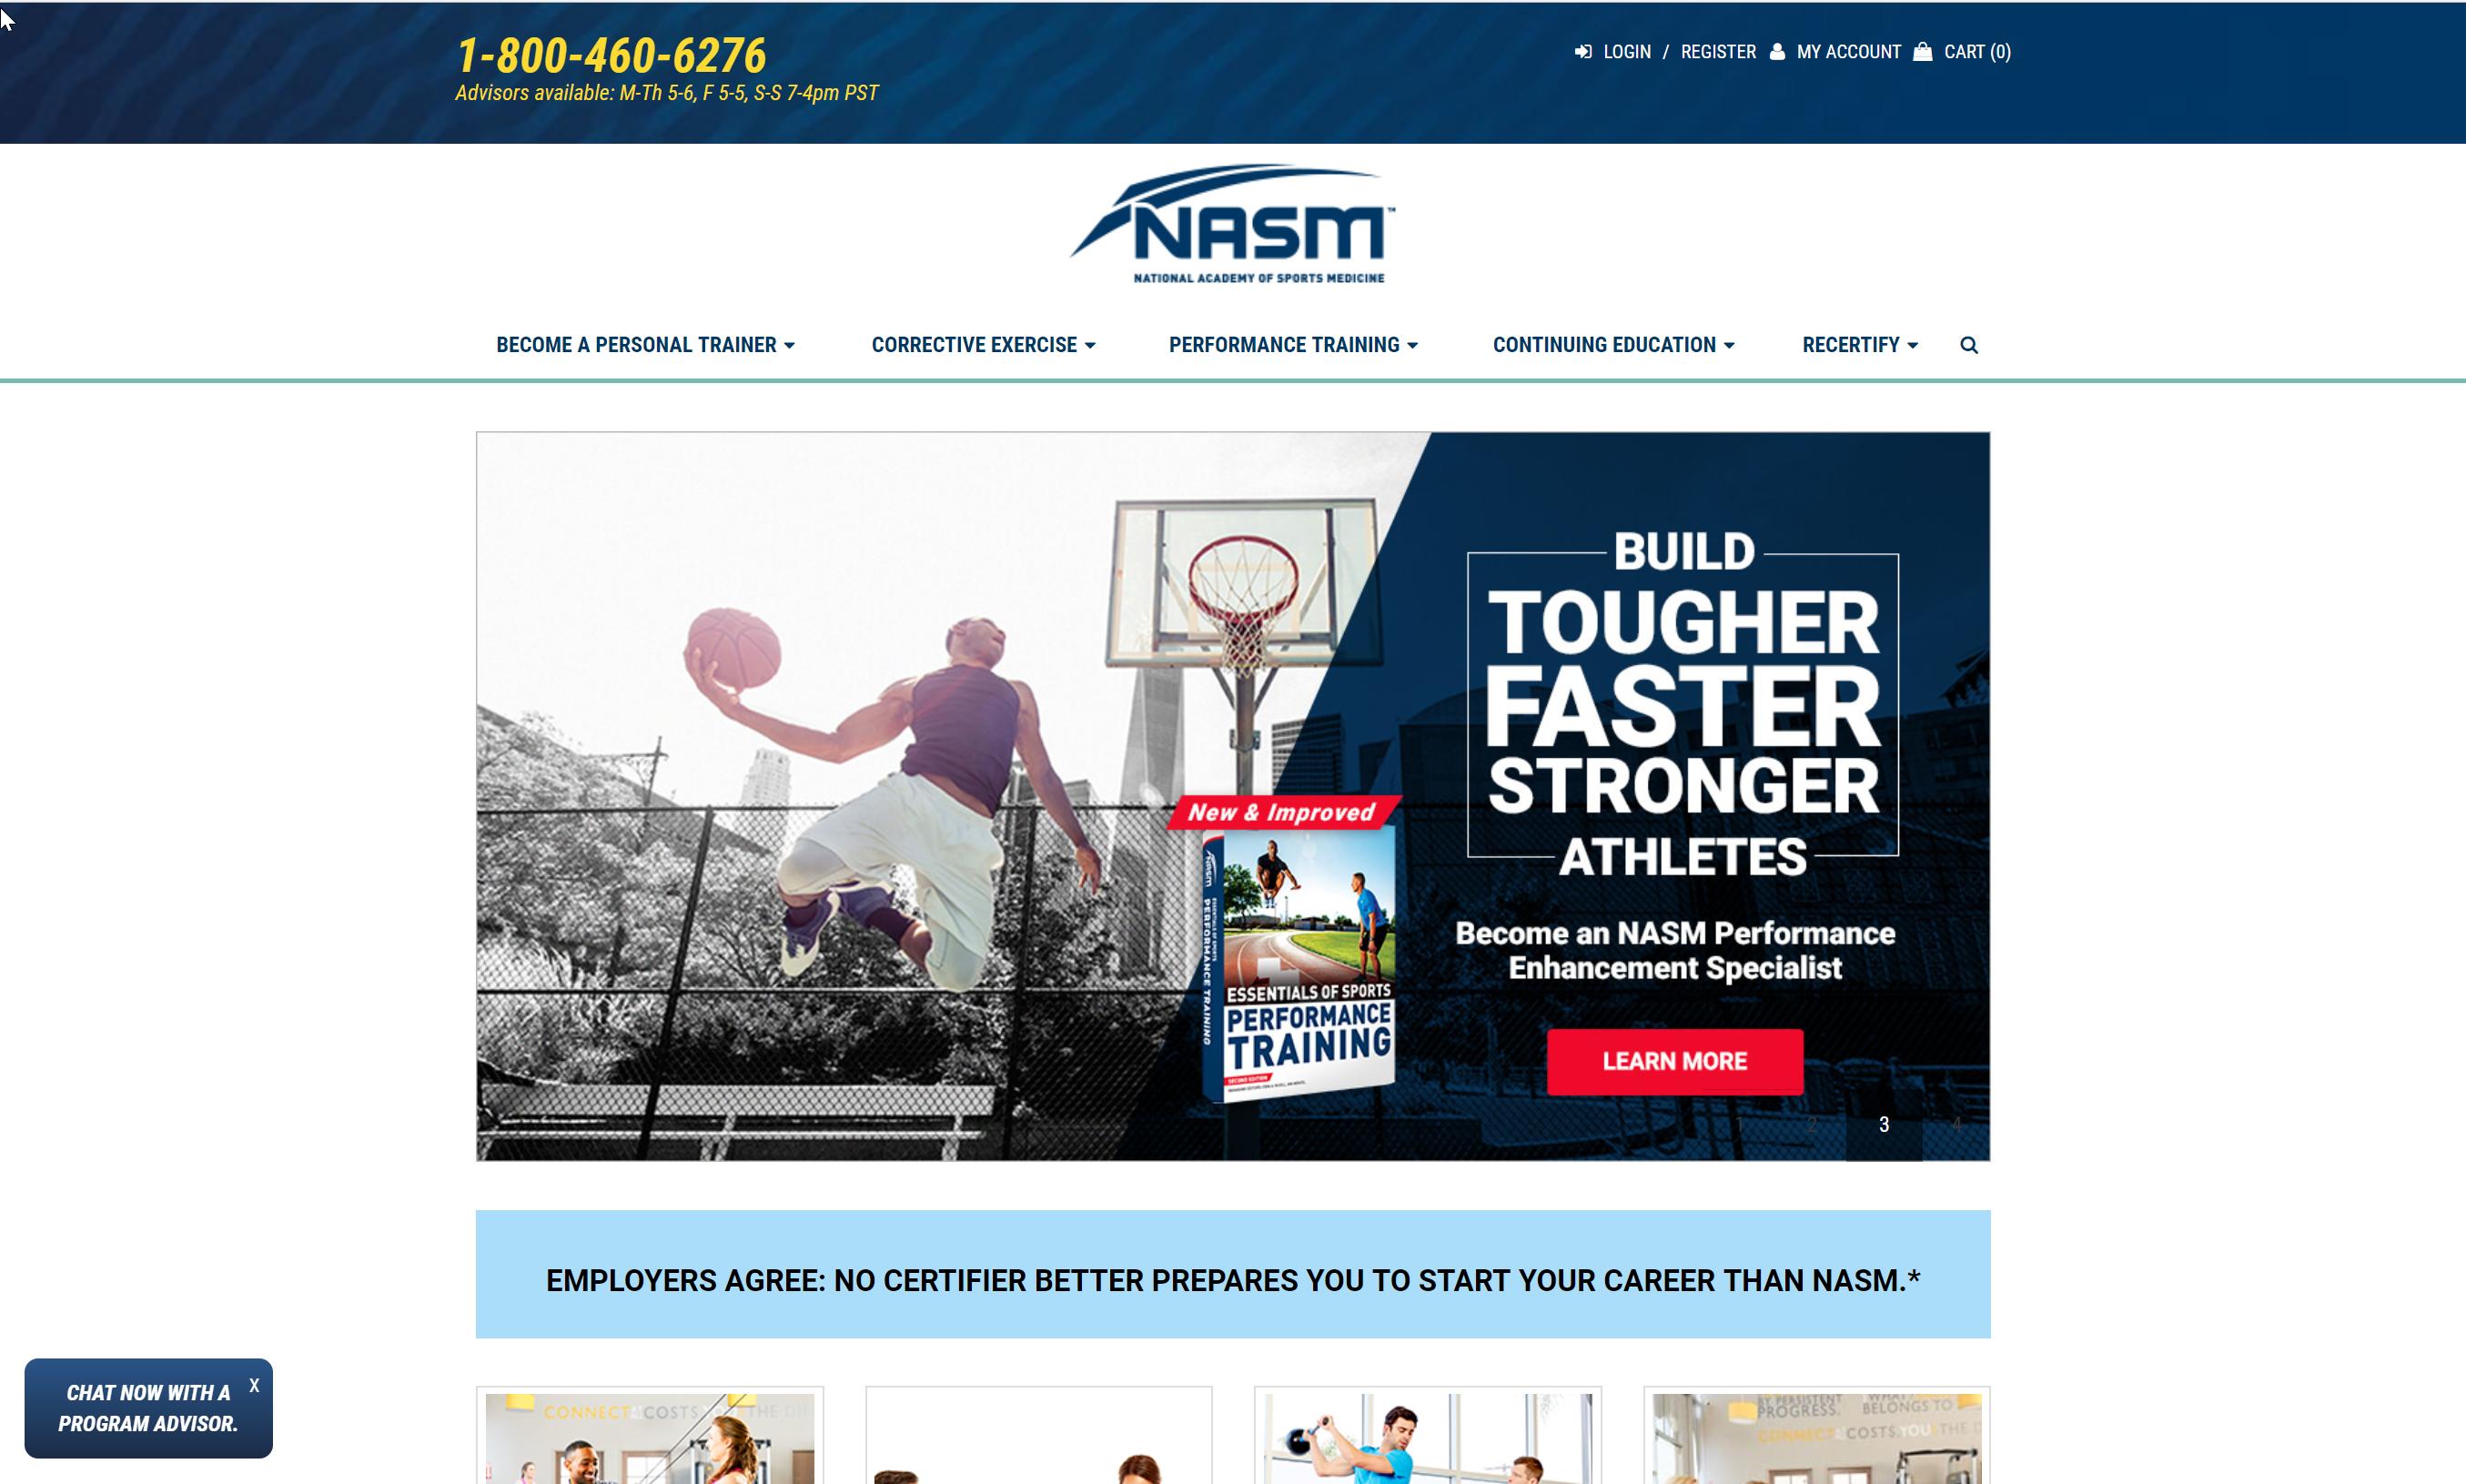 NASM Website